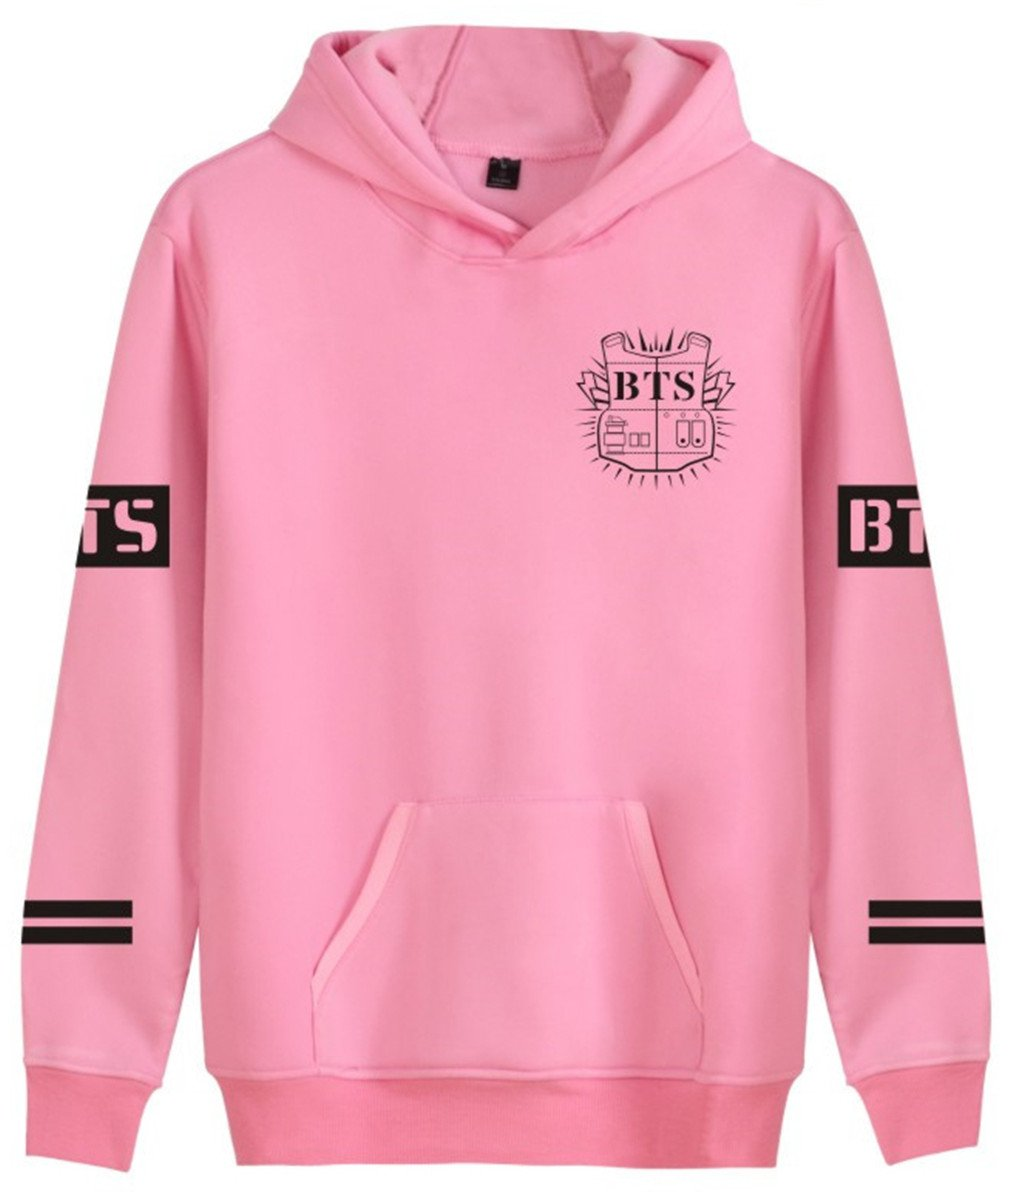 SERAPHY Unisex BTS Hoodies Bangtan Boys Sweatshirt For Women and Men Suga Jin JIMIN Jung Kook J-Hope Rap-Monster V Pink-93 4XL